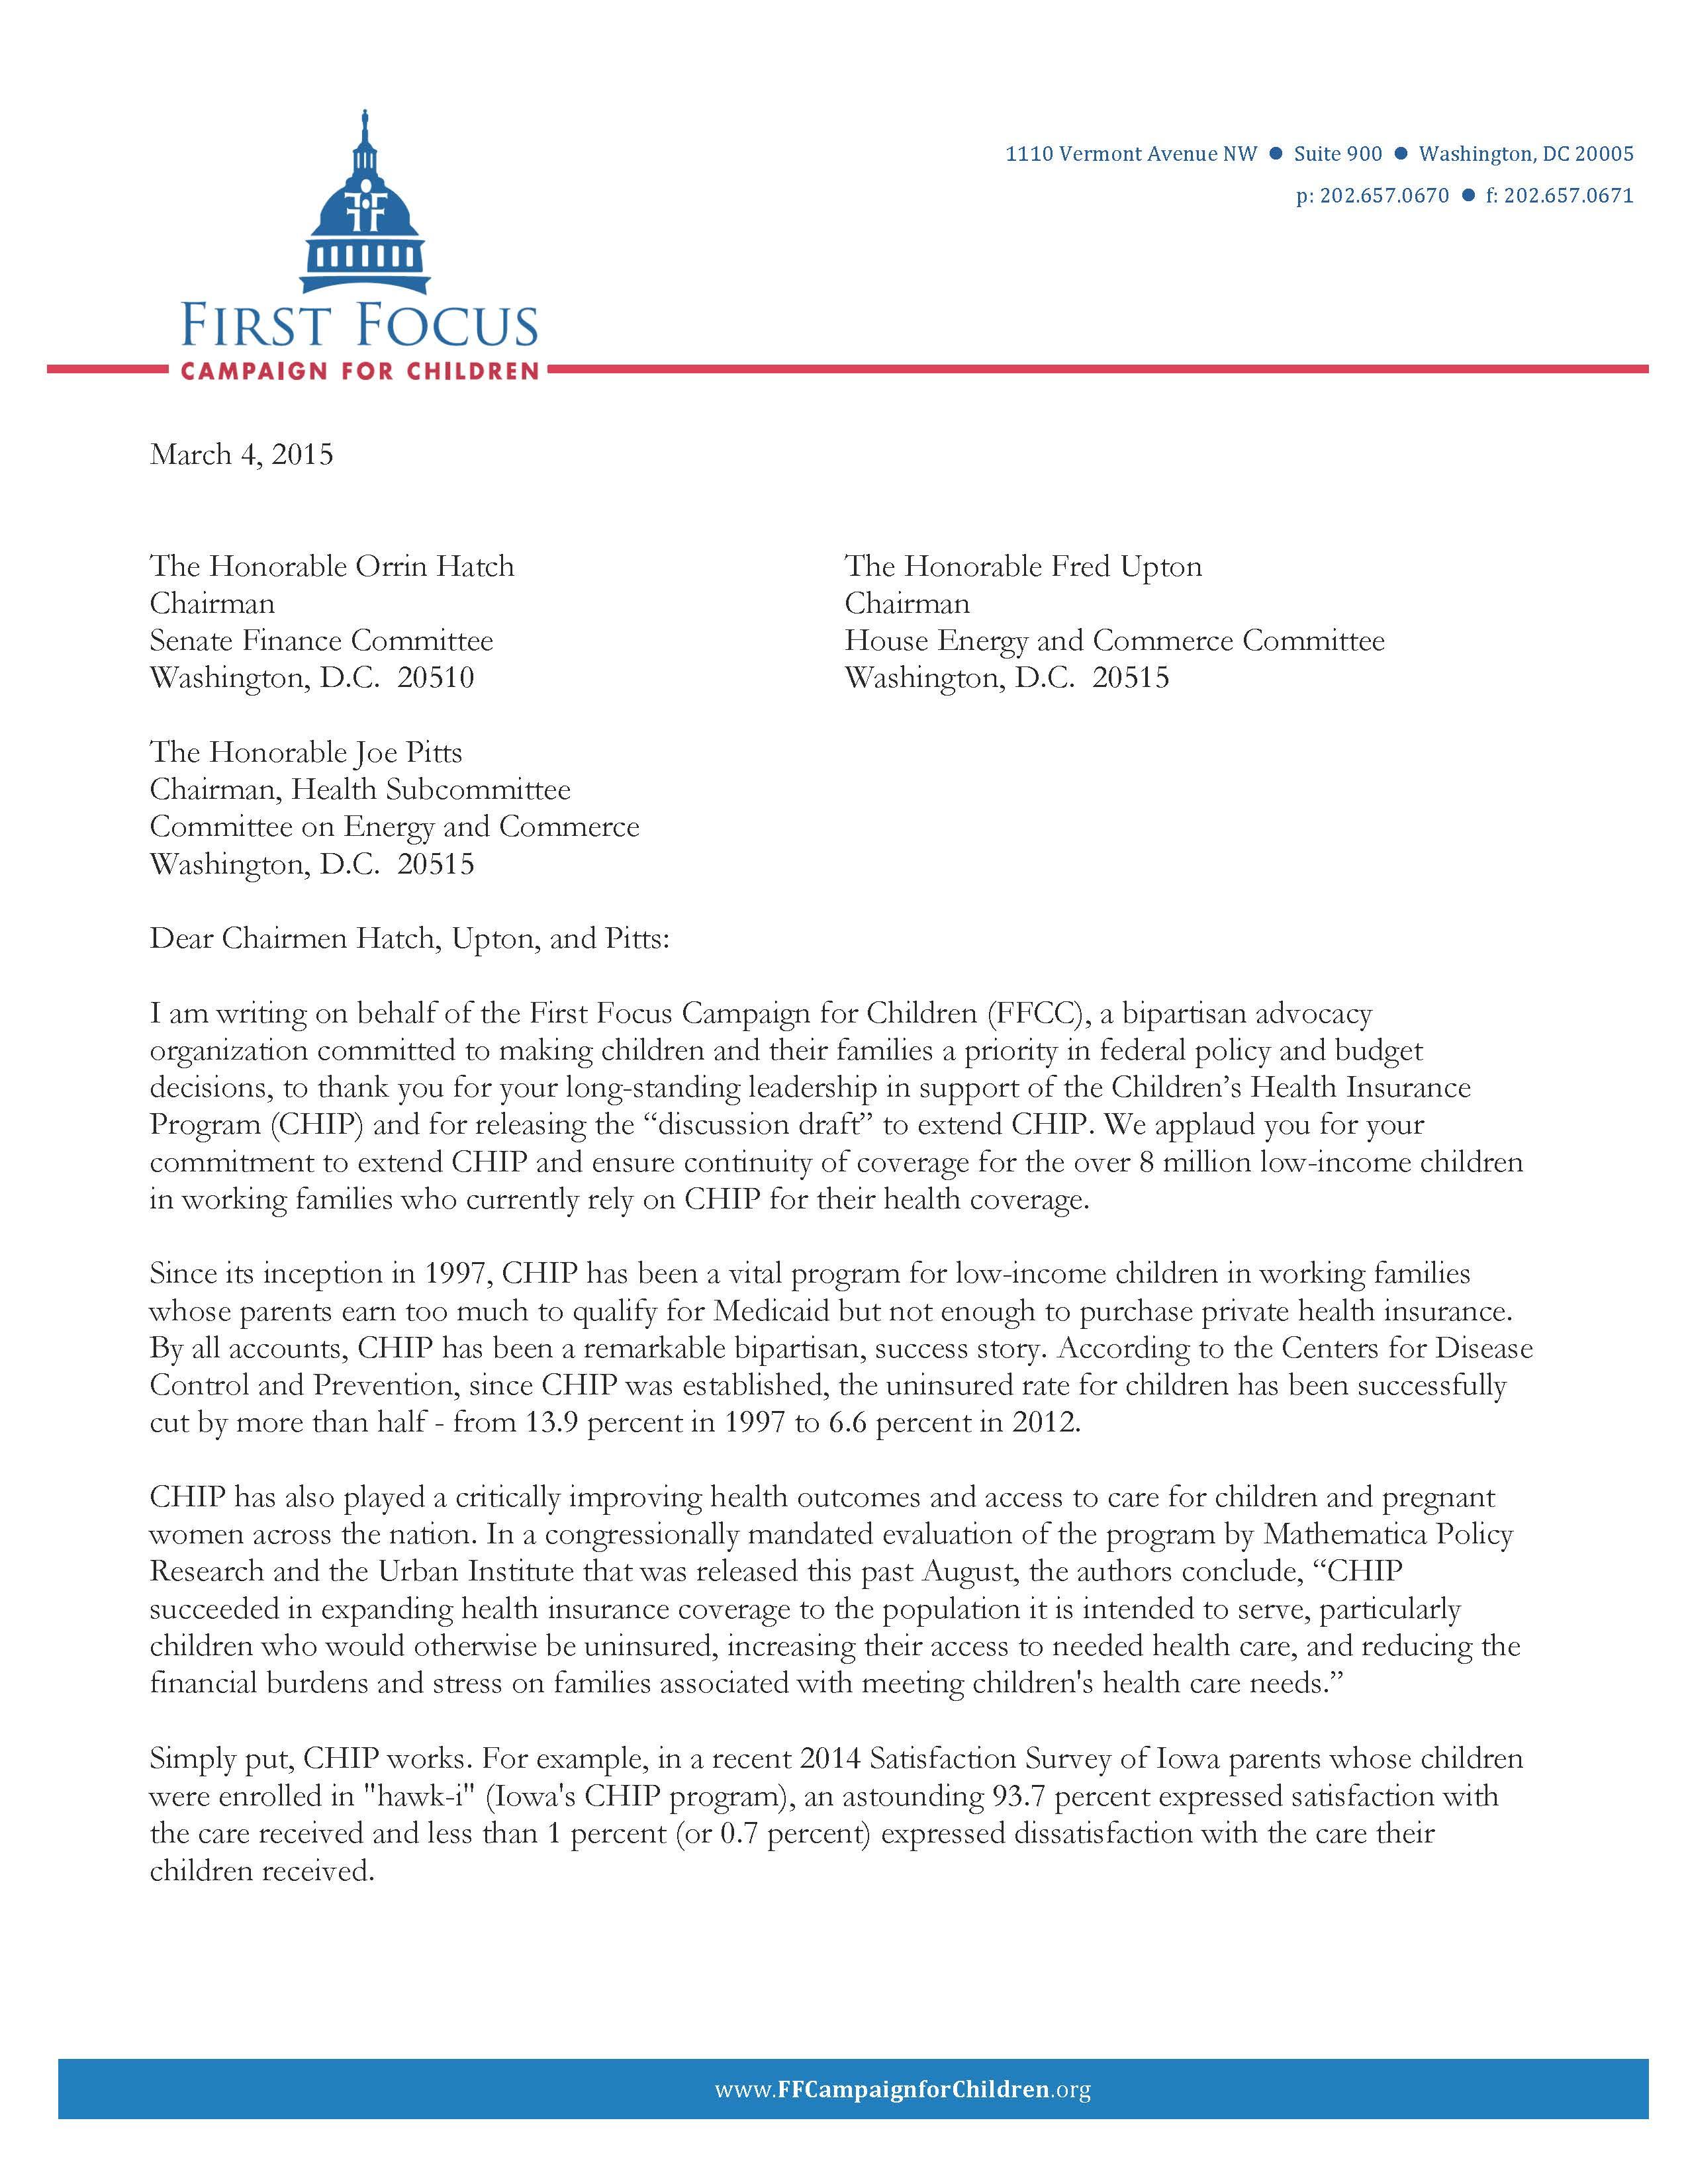 Upton-Hatch CHIP Letter FINAL 03-12-15_Page_1